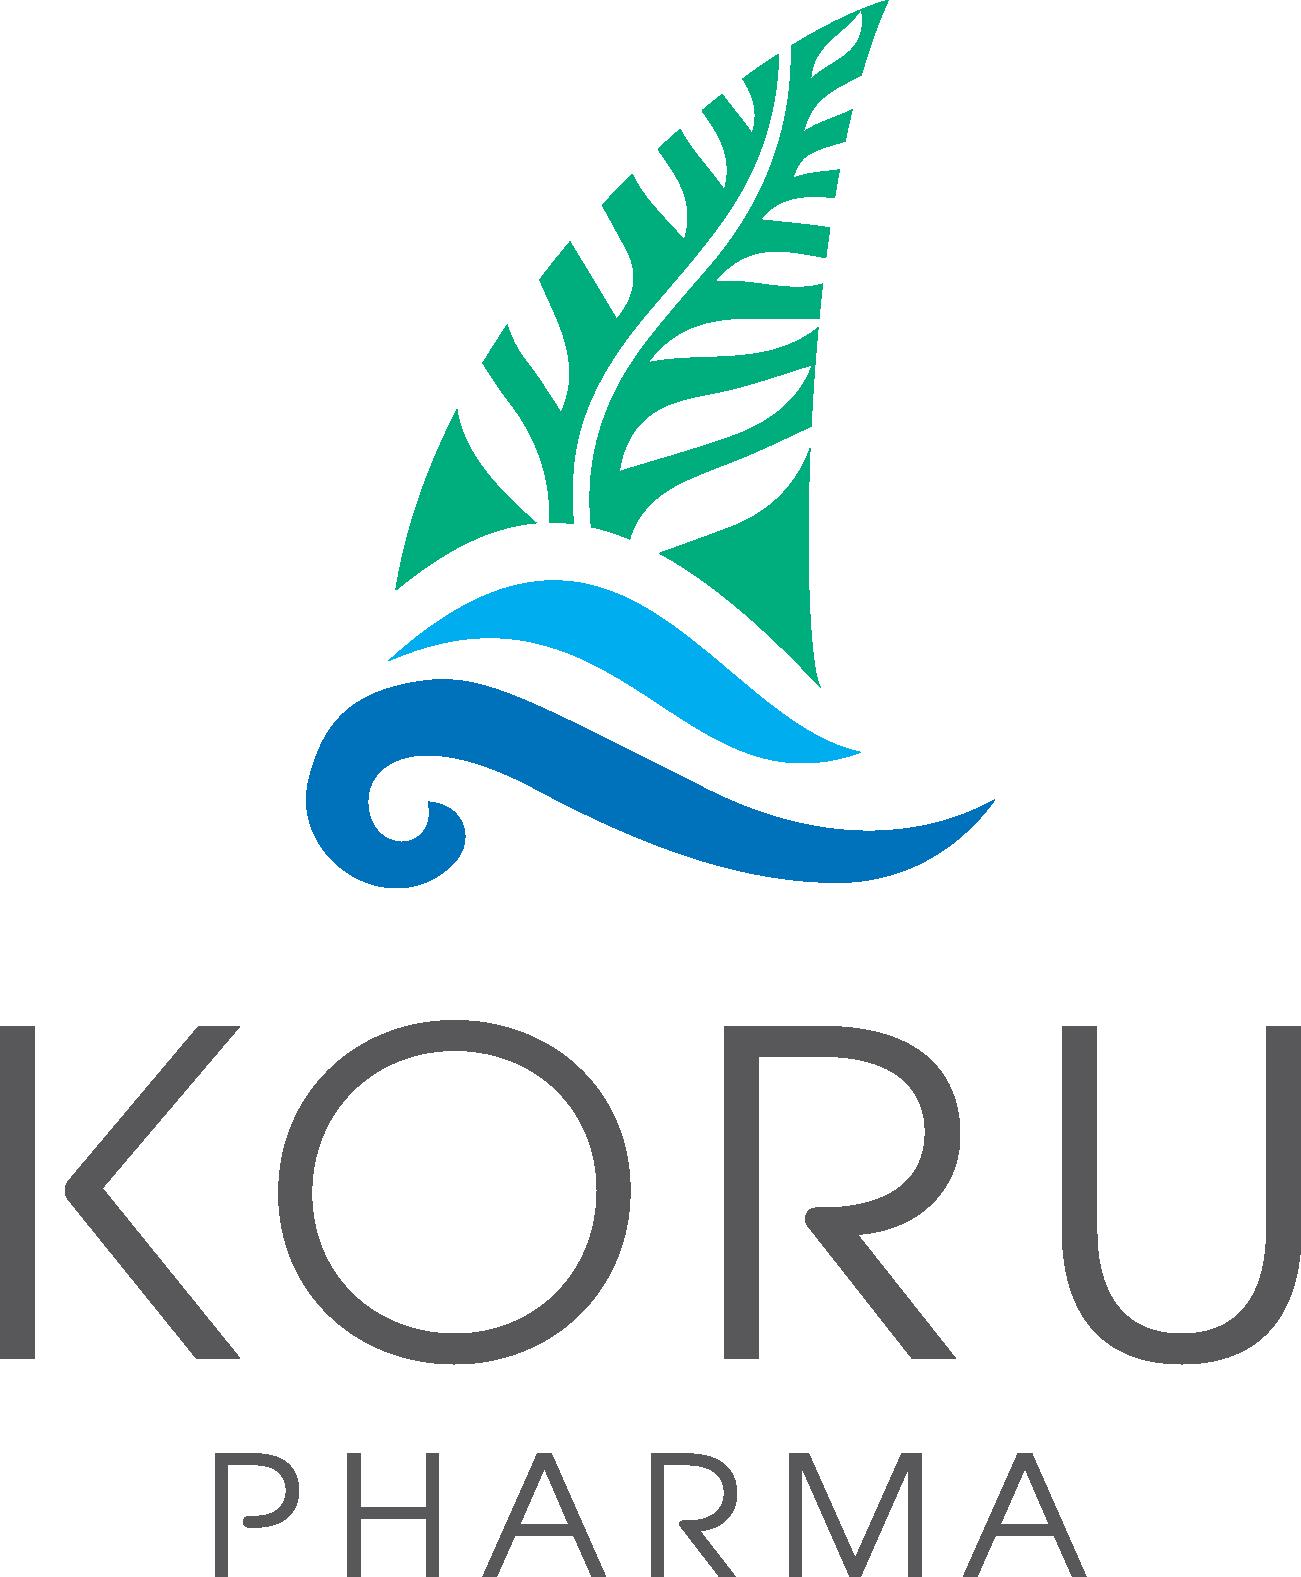 Koru Pharmaceuticals